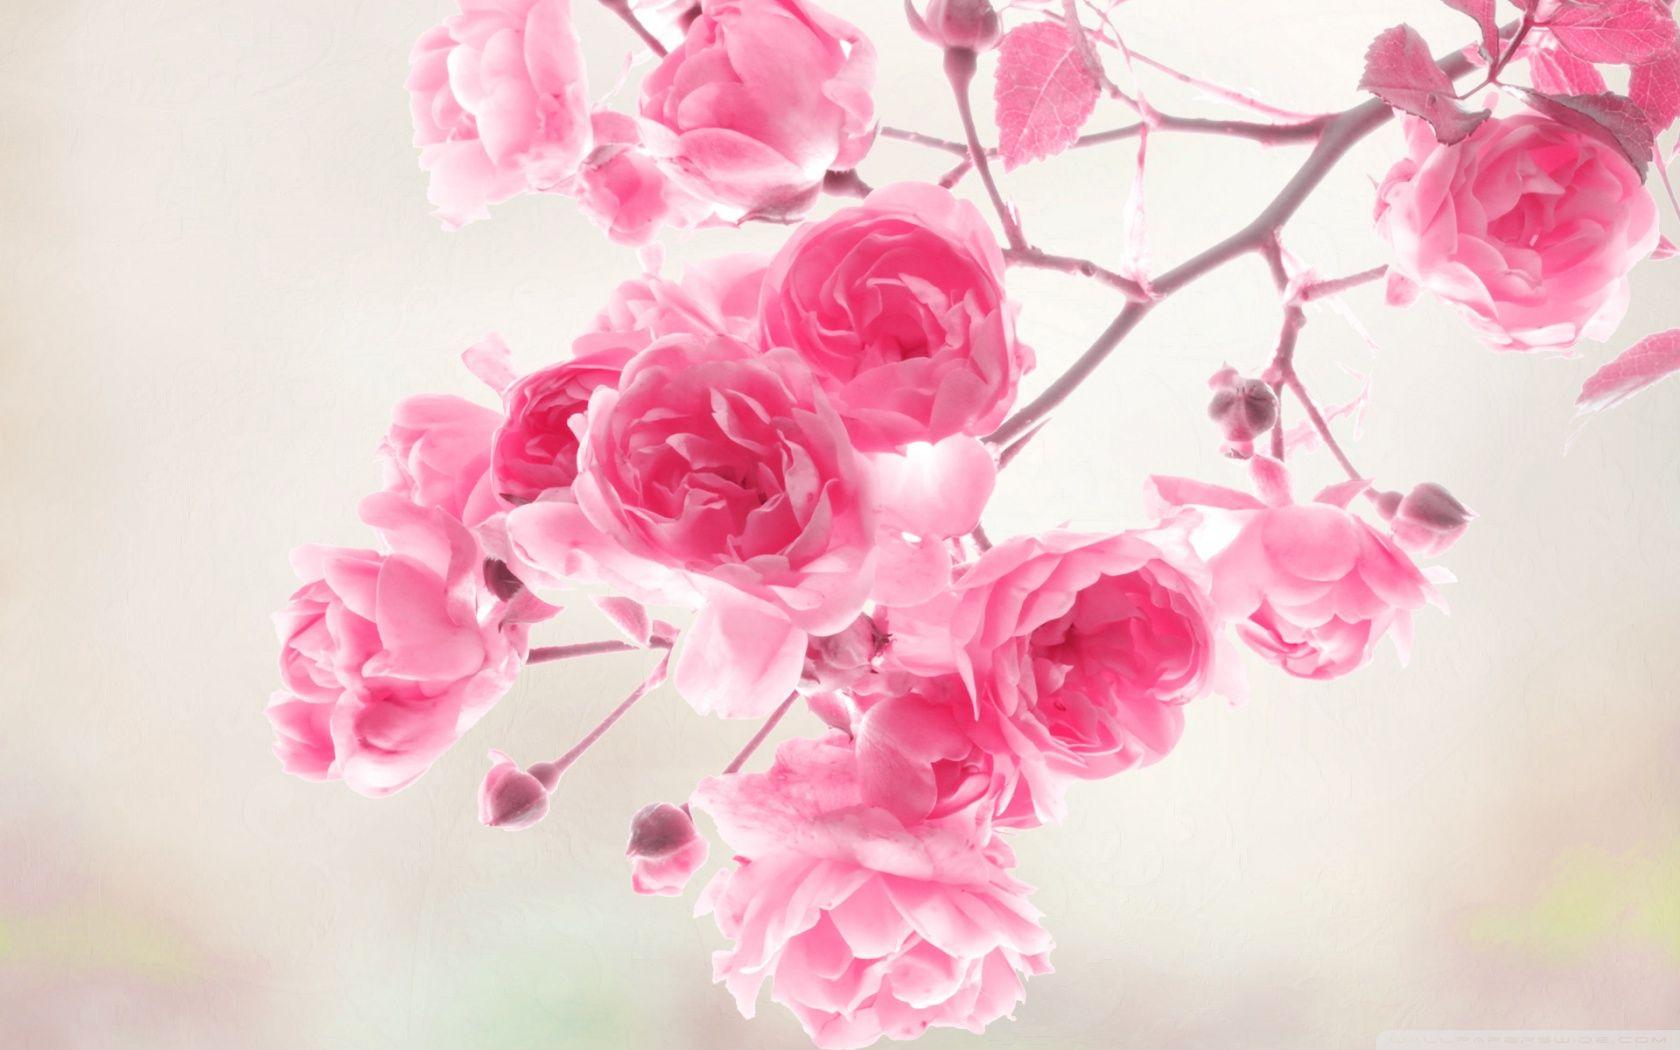 Rose flower wallpaper hd hd wallpapers pinterest rose flowers rose flower wallpaper hd izmirmasajfo